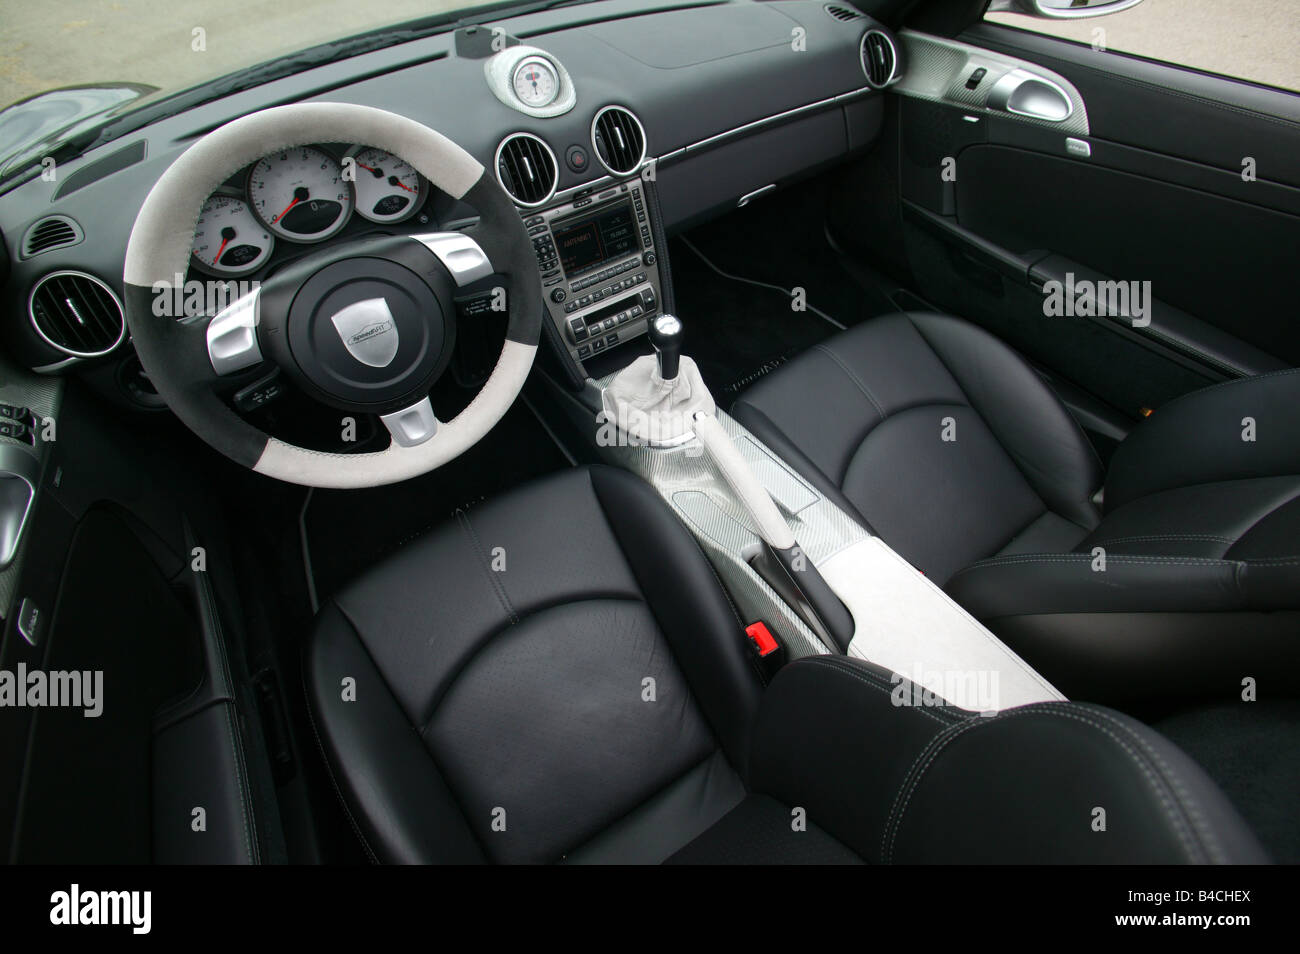 Speedart Porsche Boxster, model year 2005, black/silver